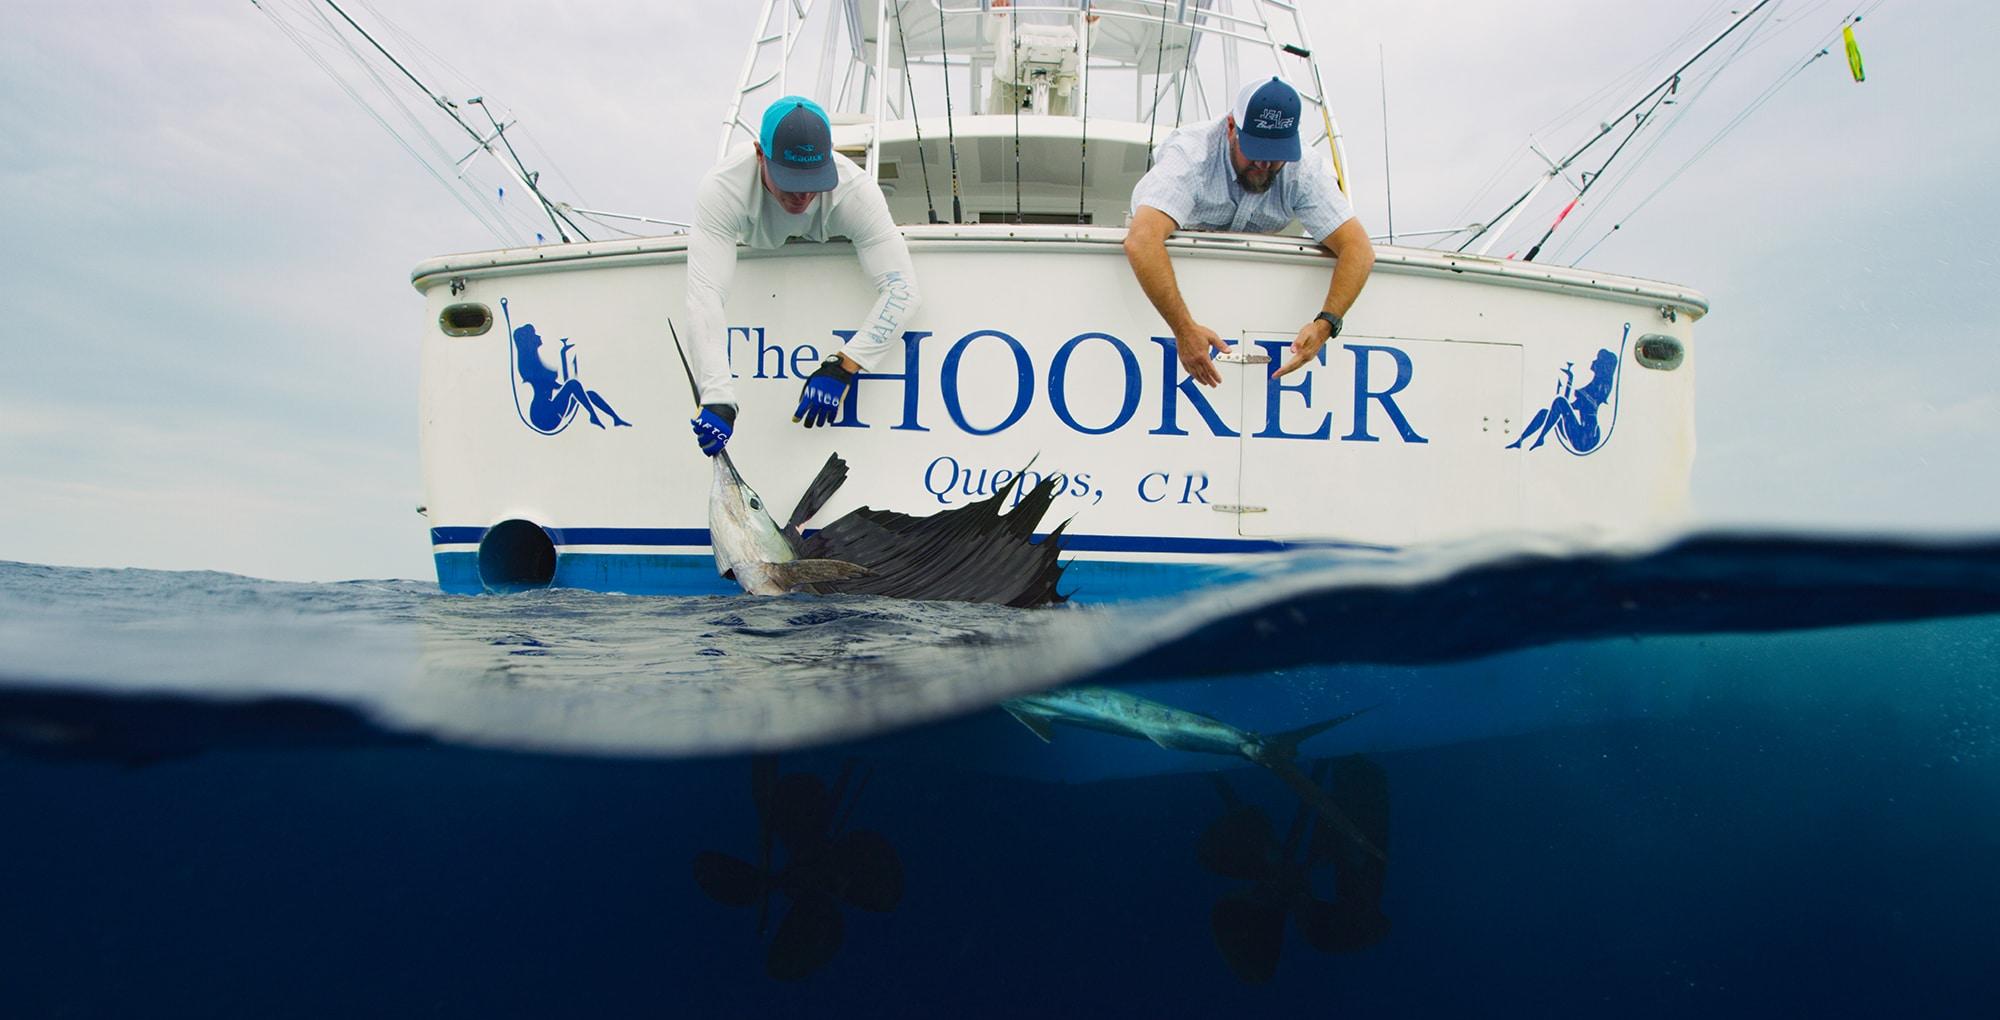 The hooker boat